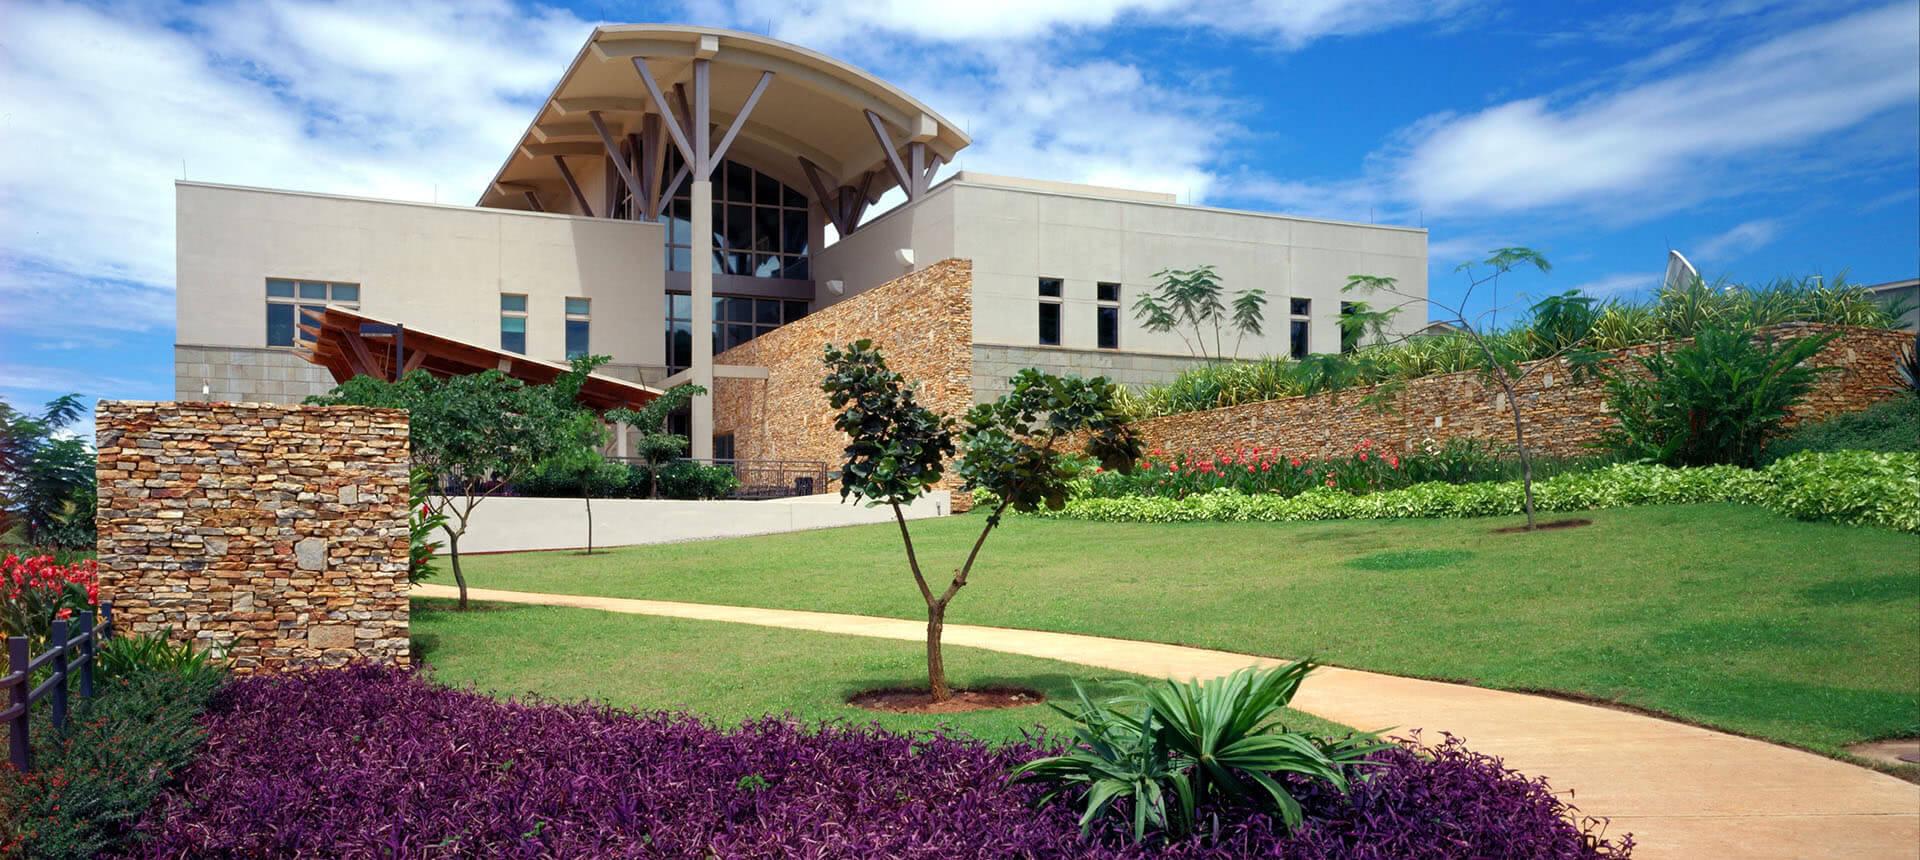 US Embassy Kampals Landscape Architecture